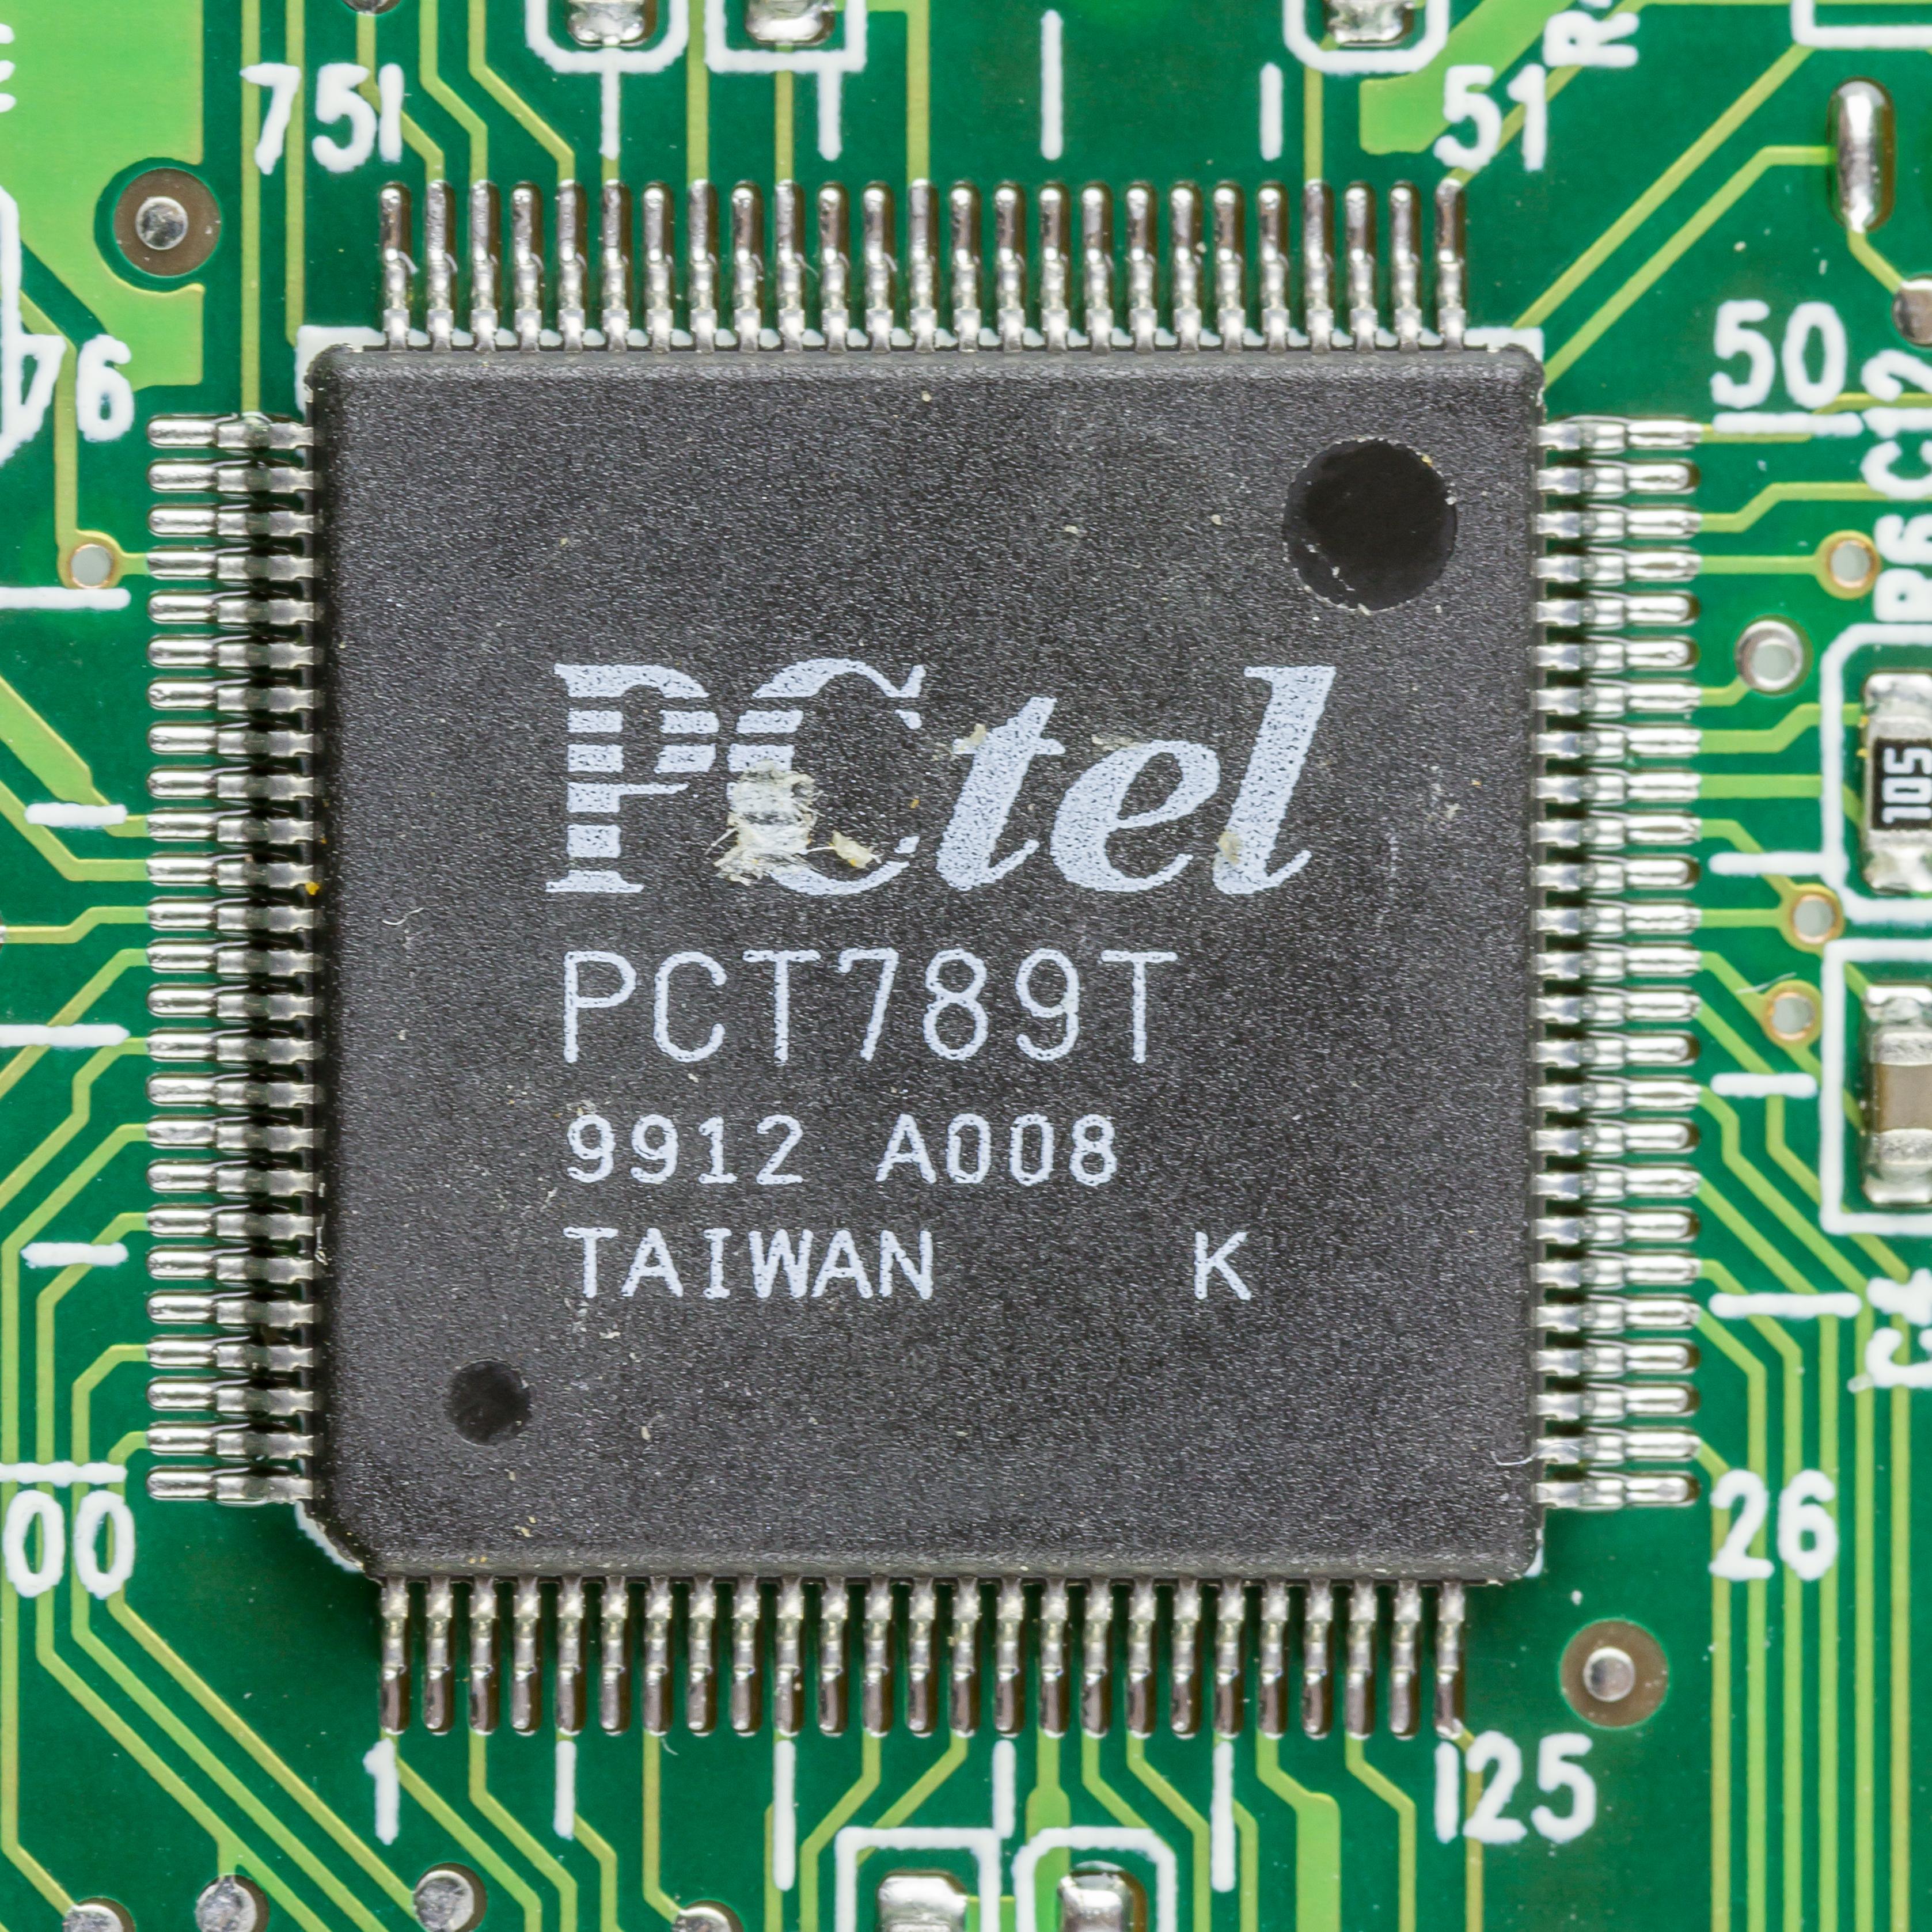 PCTEL PCT789T DRIVERS FOR PC